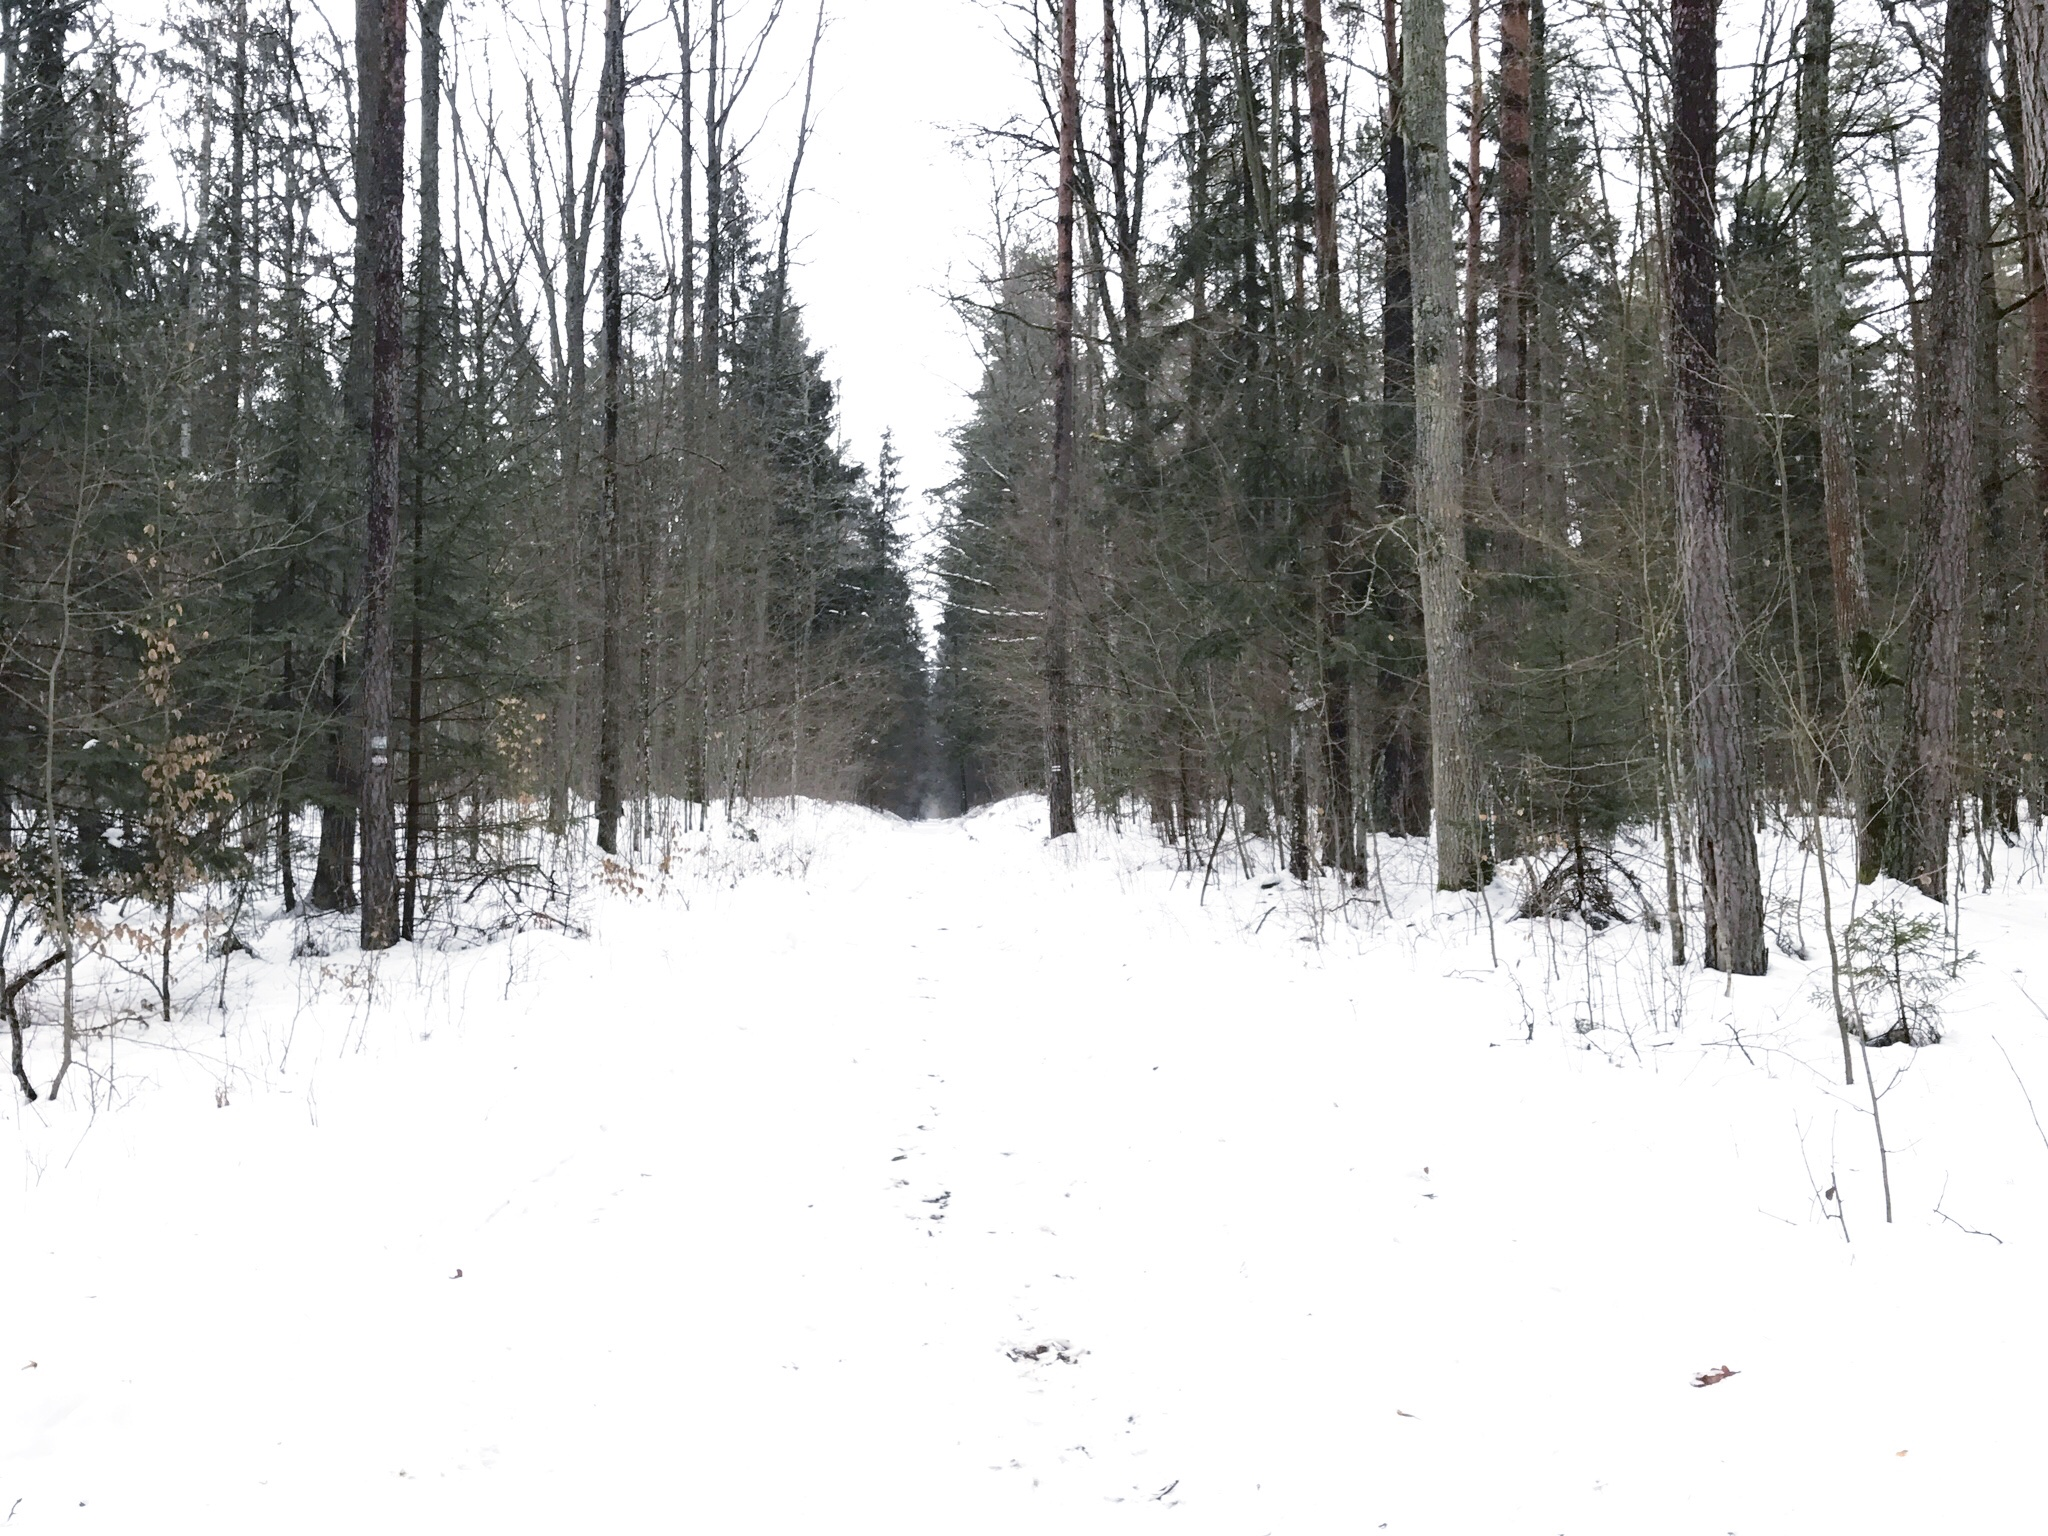 forest-path-bialowieza-forest.jpg